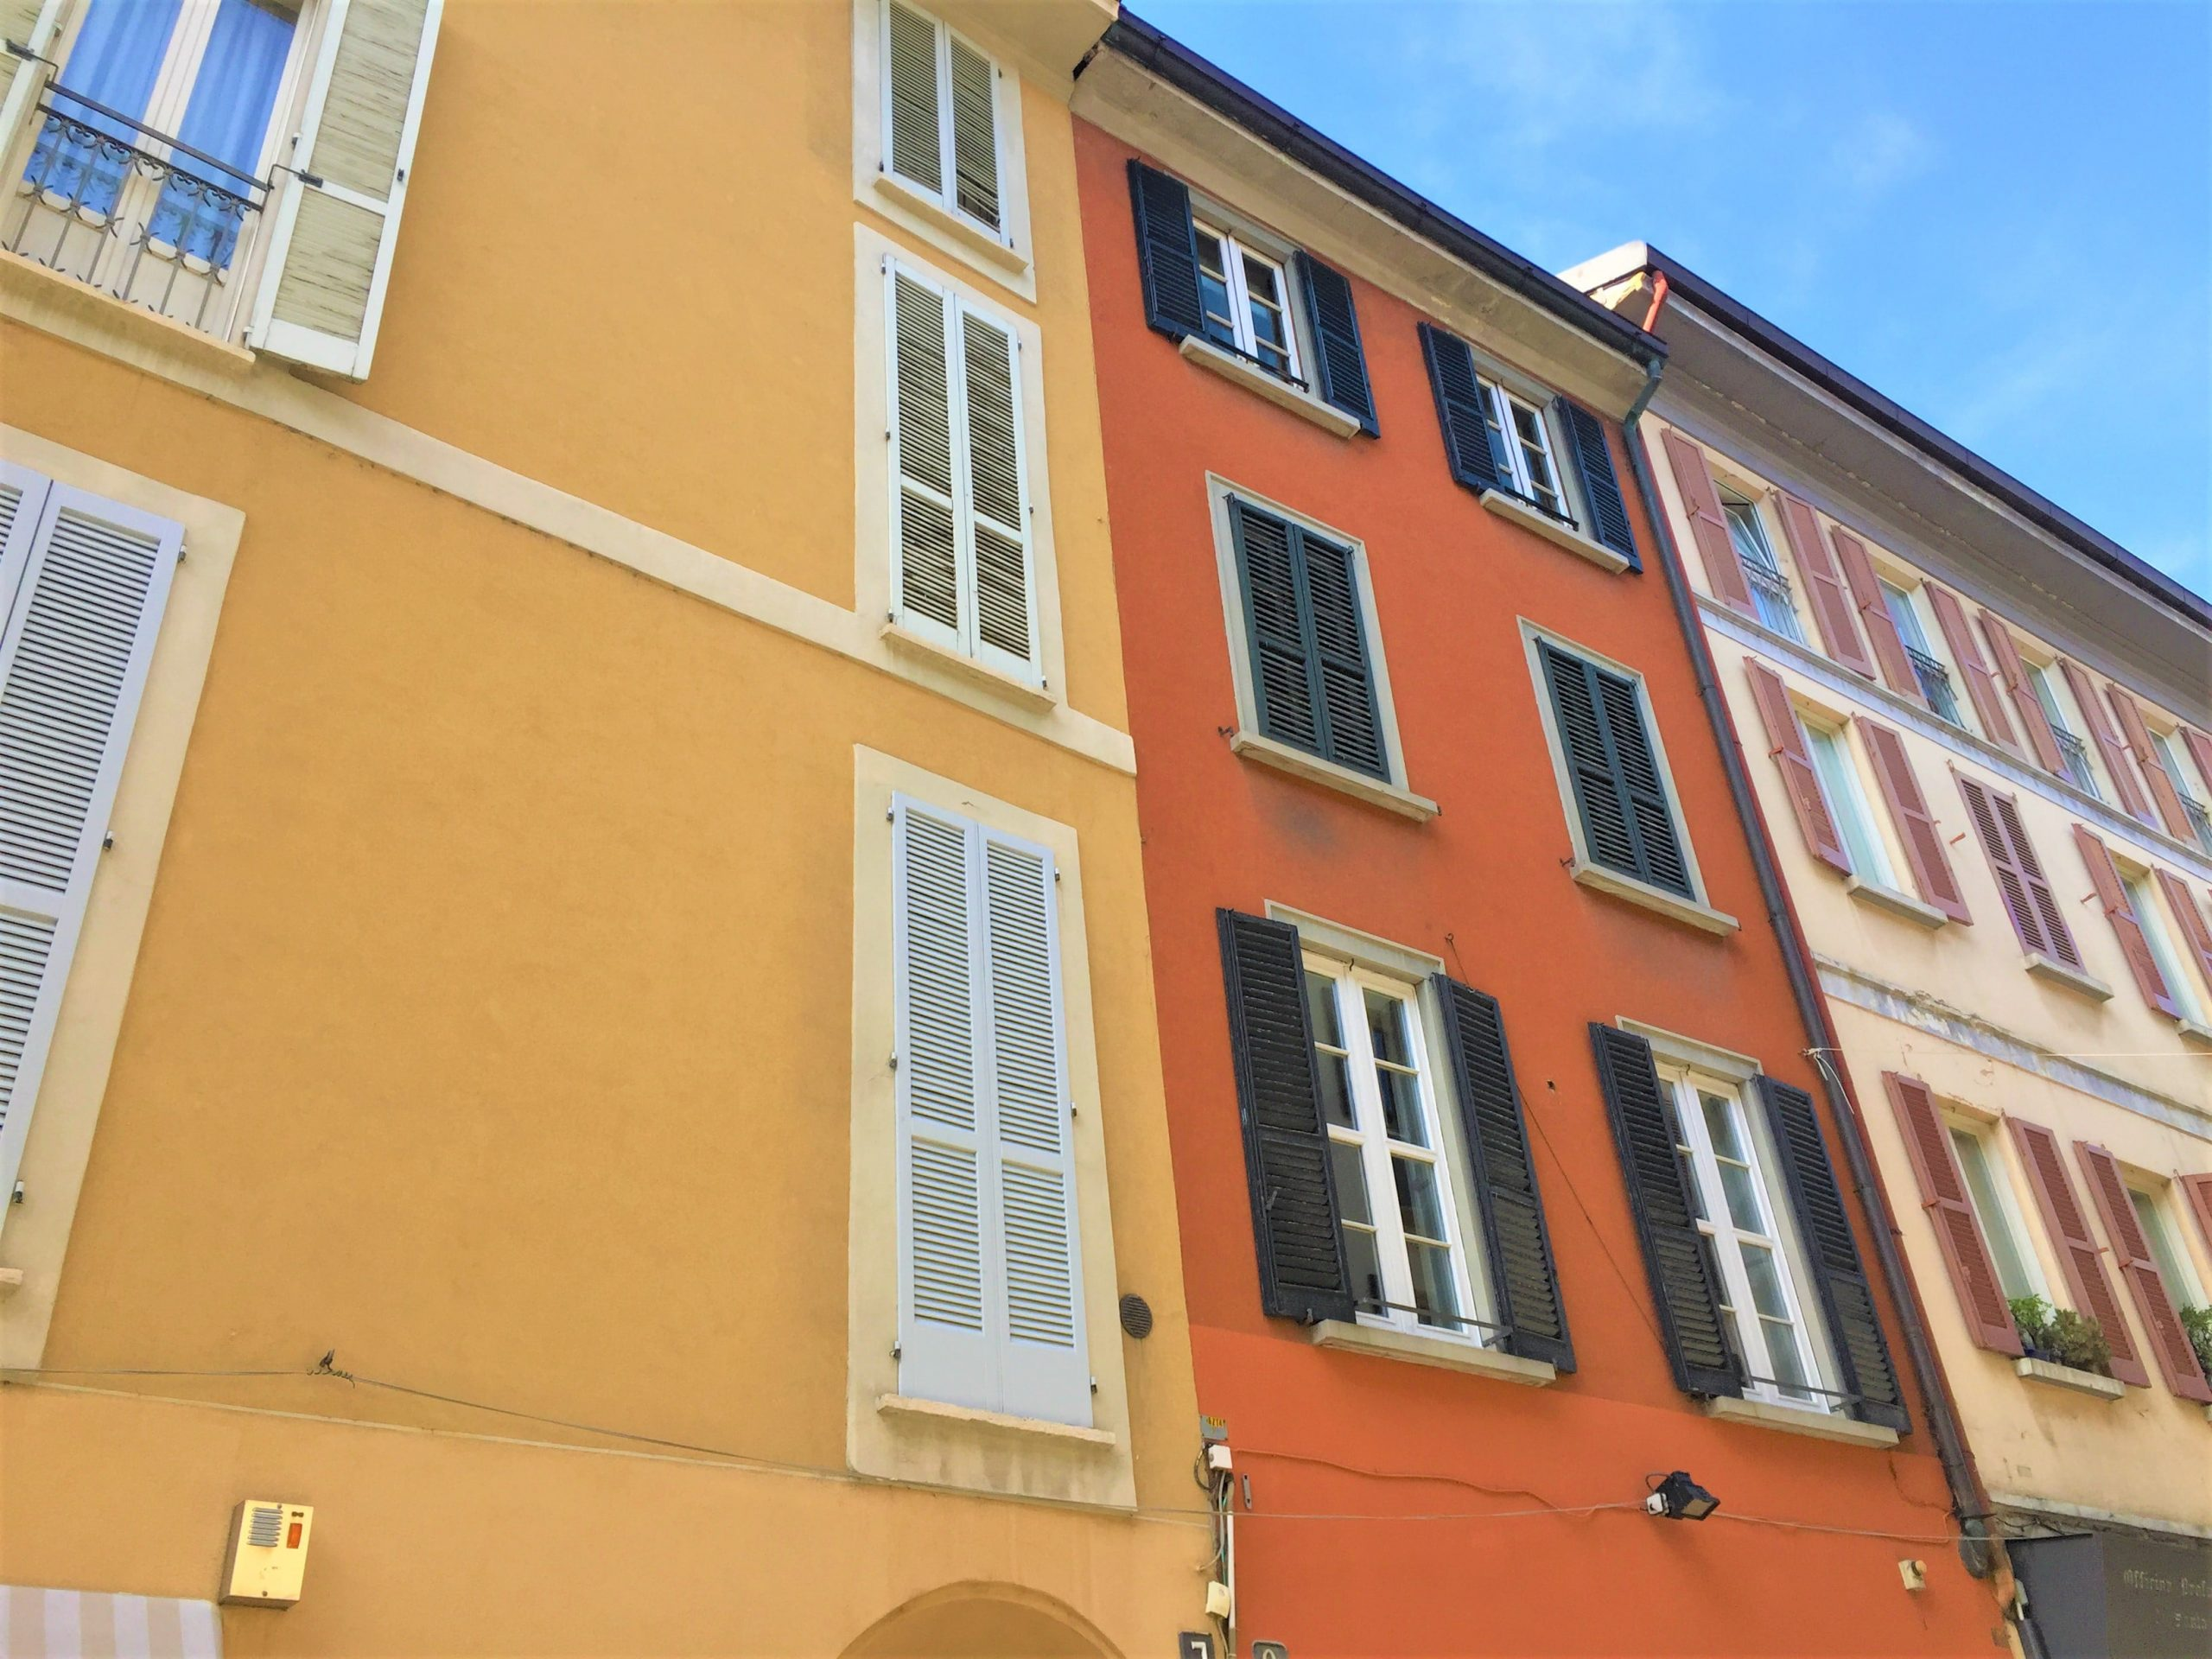 visiter Milan le quartier brera